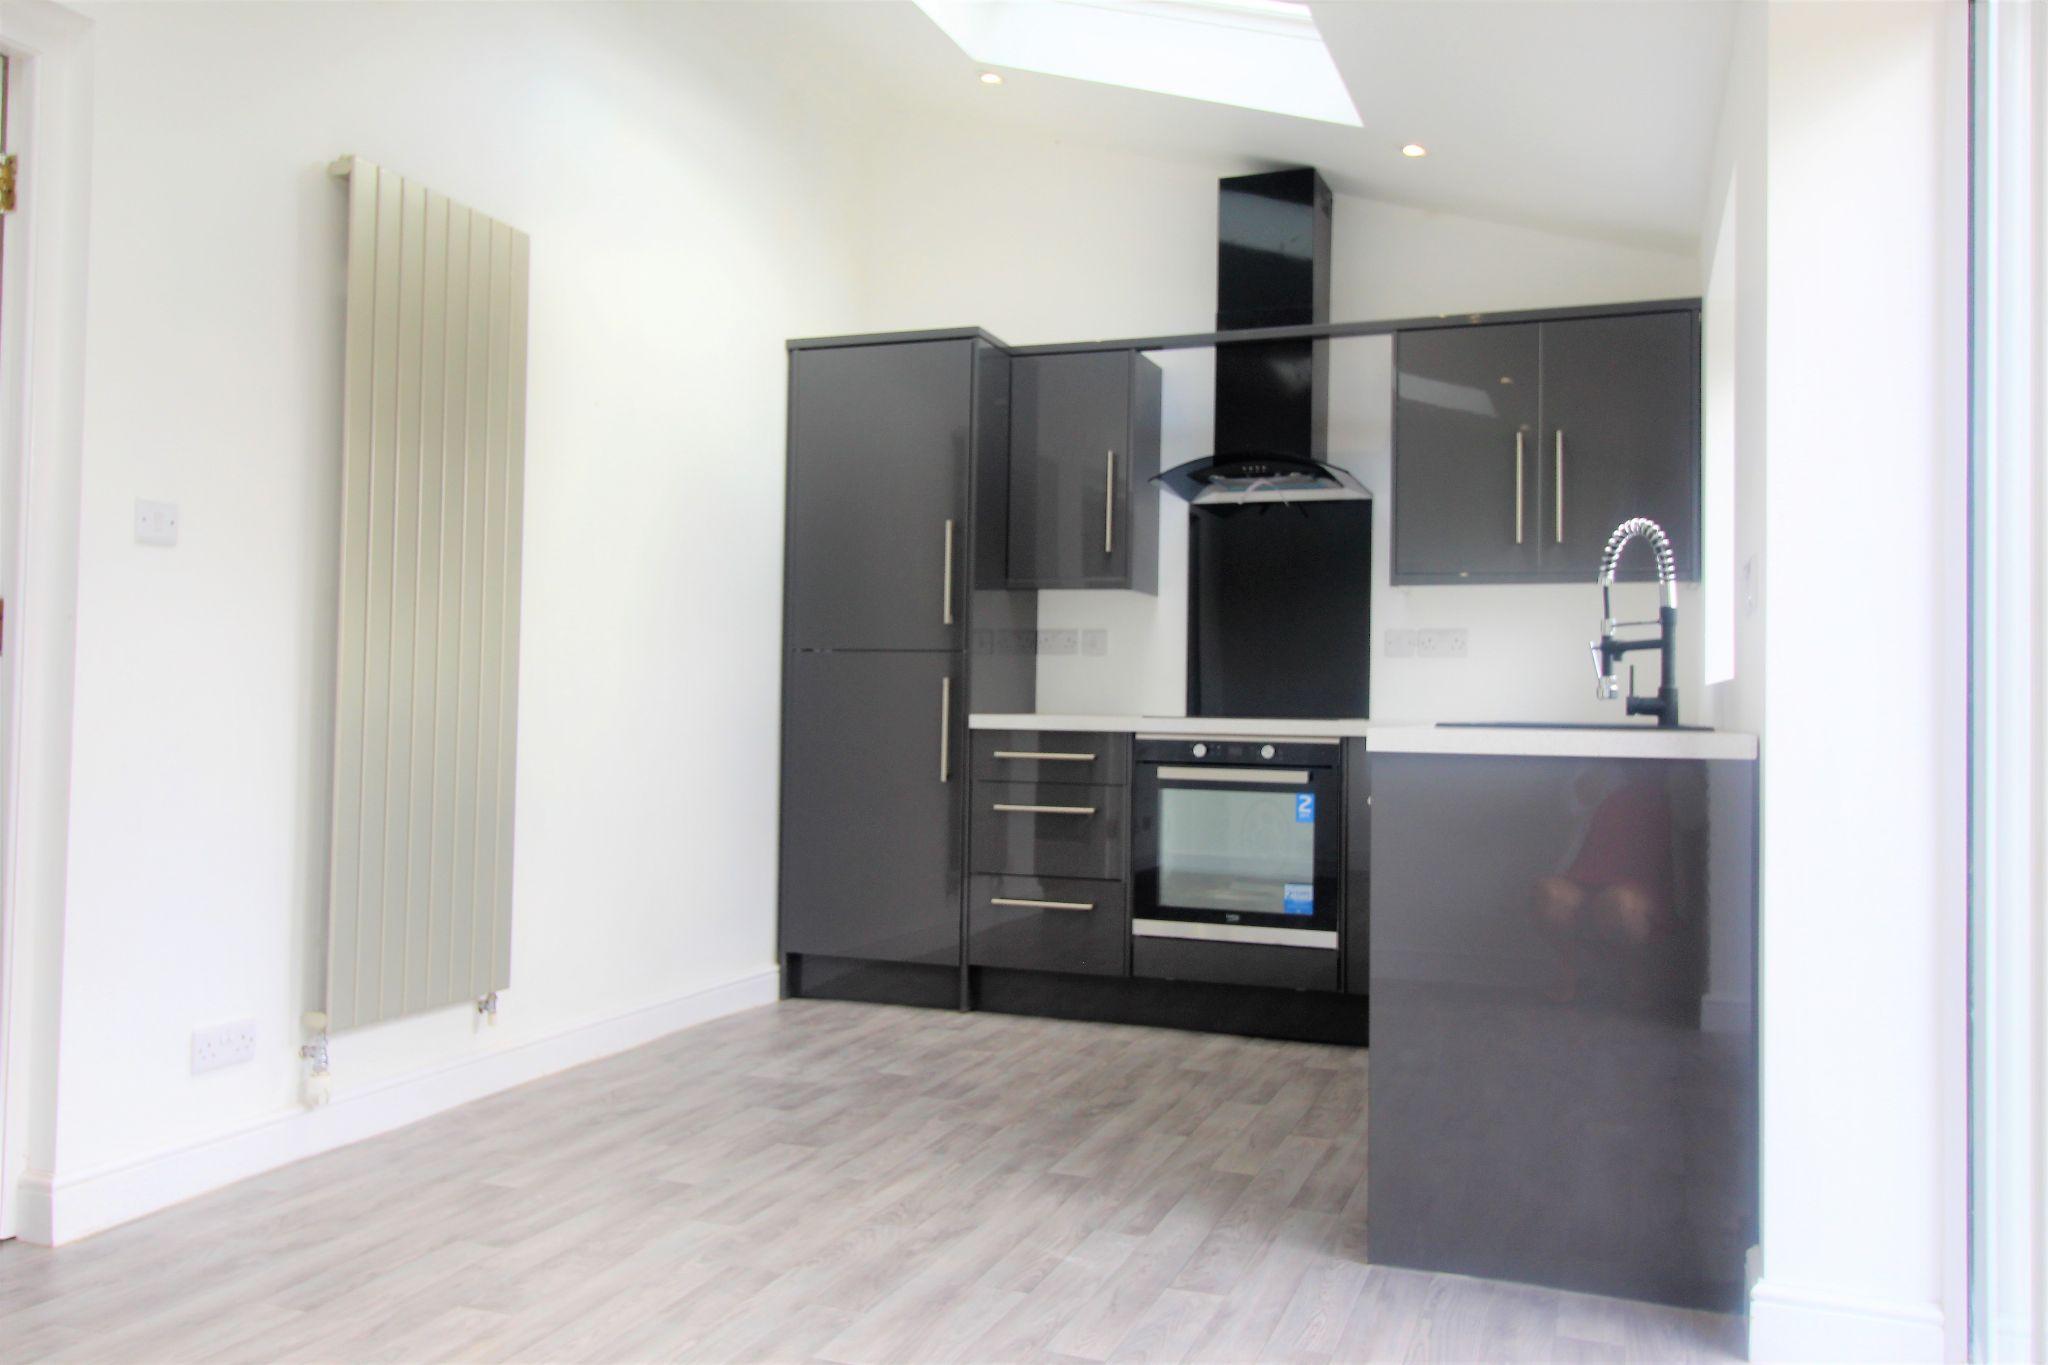 3 Bedroom Detached House For Sale - Kitchen 2